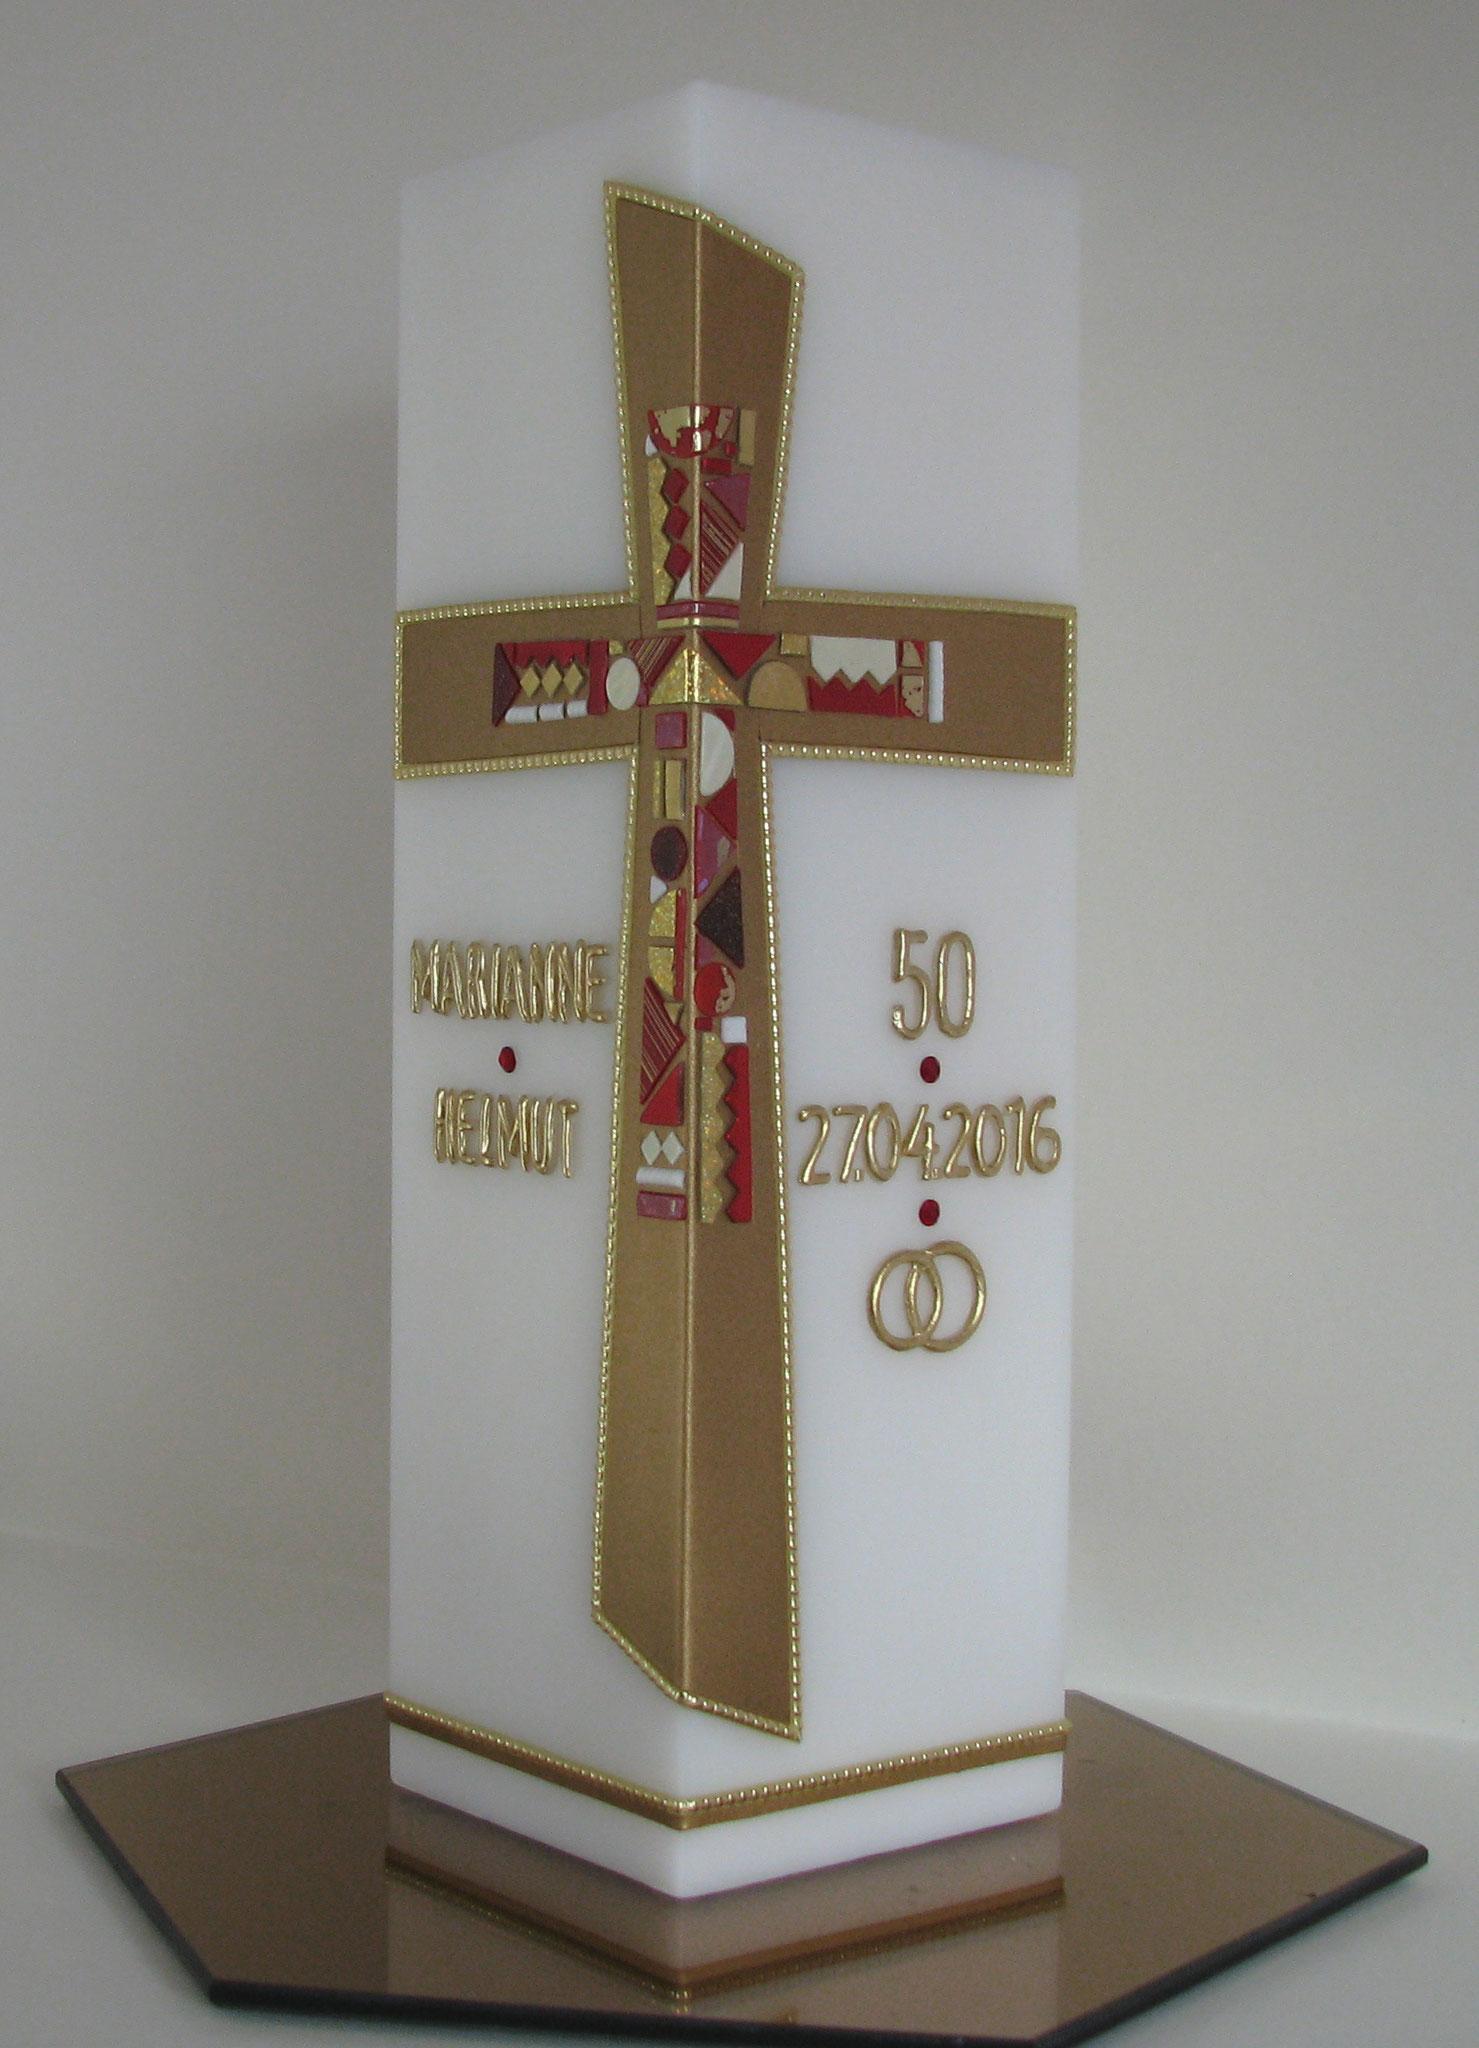 HE-0011, quadratisch, HxB ca. 24 cm x 7,5 cm, Preis ca. € 52,--